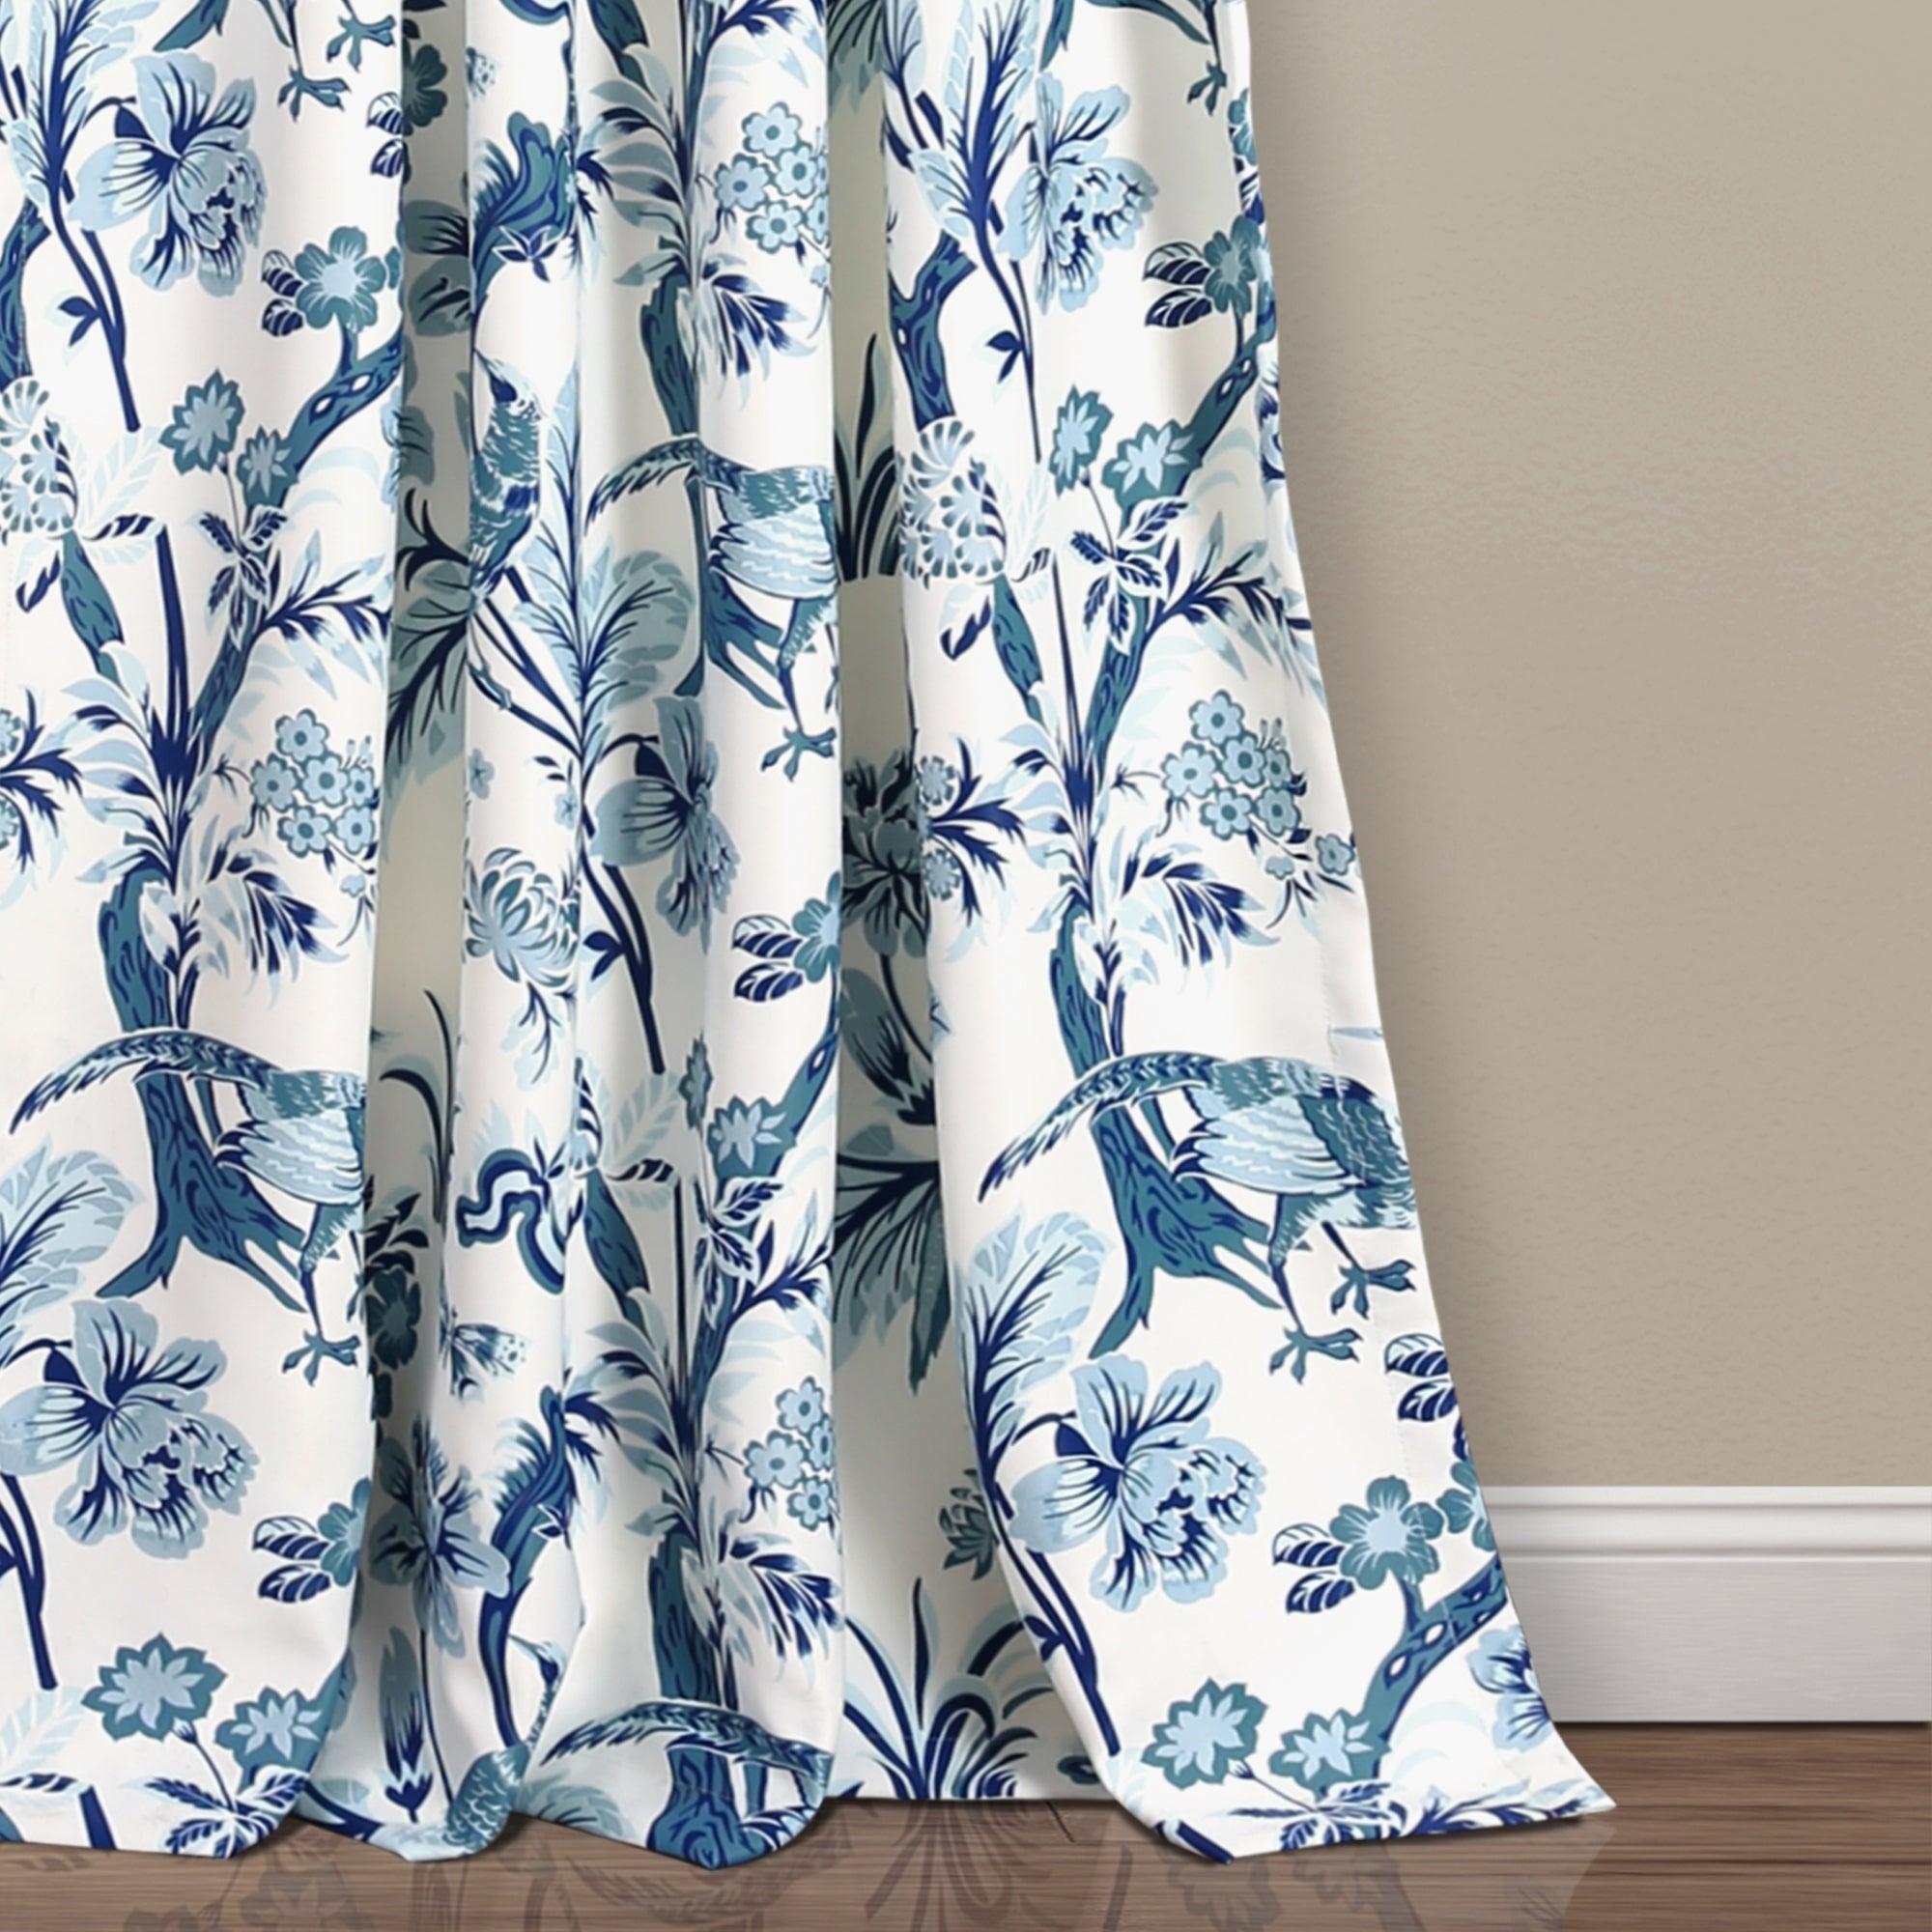 Lush Decor Dolores Room Darkening Floral Curtain Panel Pair Intended For Dolores Room Darkening Floral Curtain Panel Pairs (View 4 of 20)